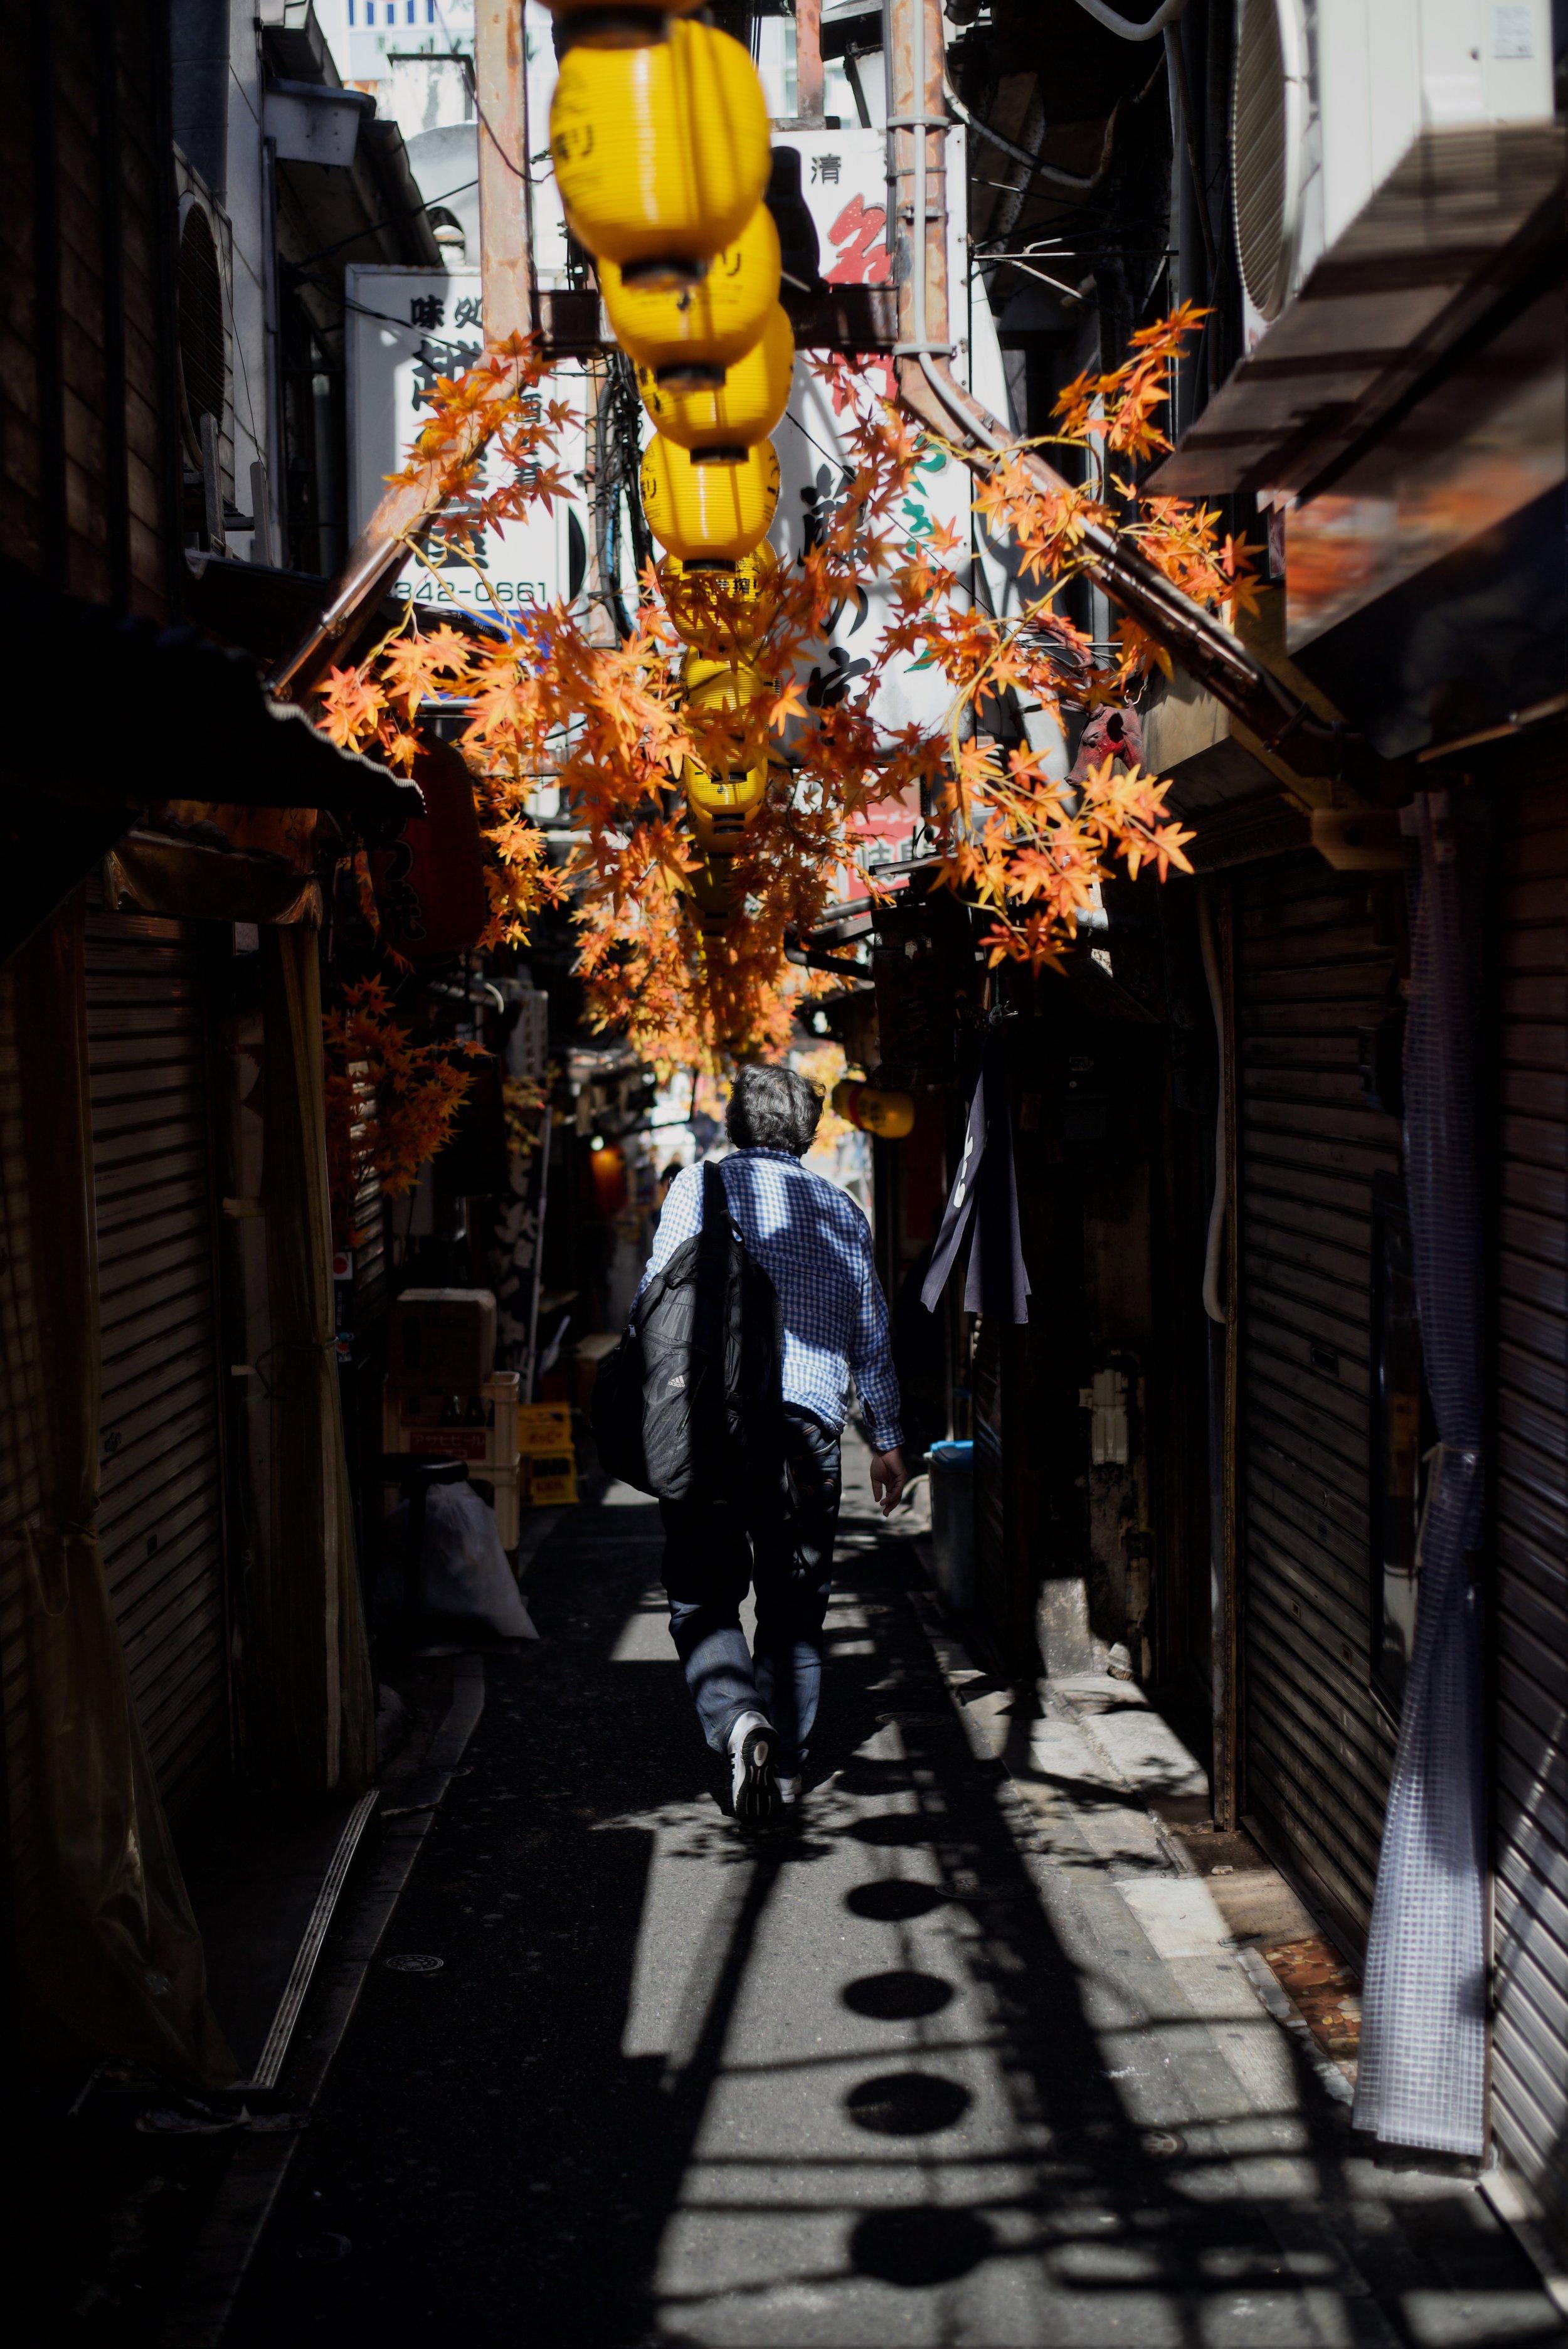 Principle-Long-Fall-Overcat-Shinjuku-Golden-Gai-7.JPG